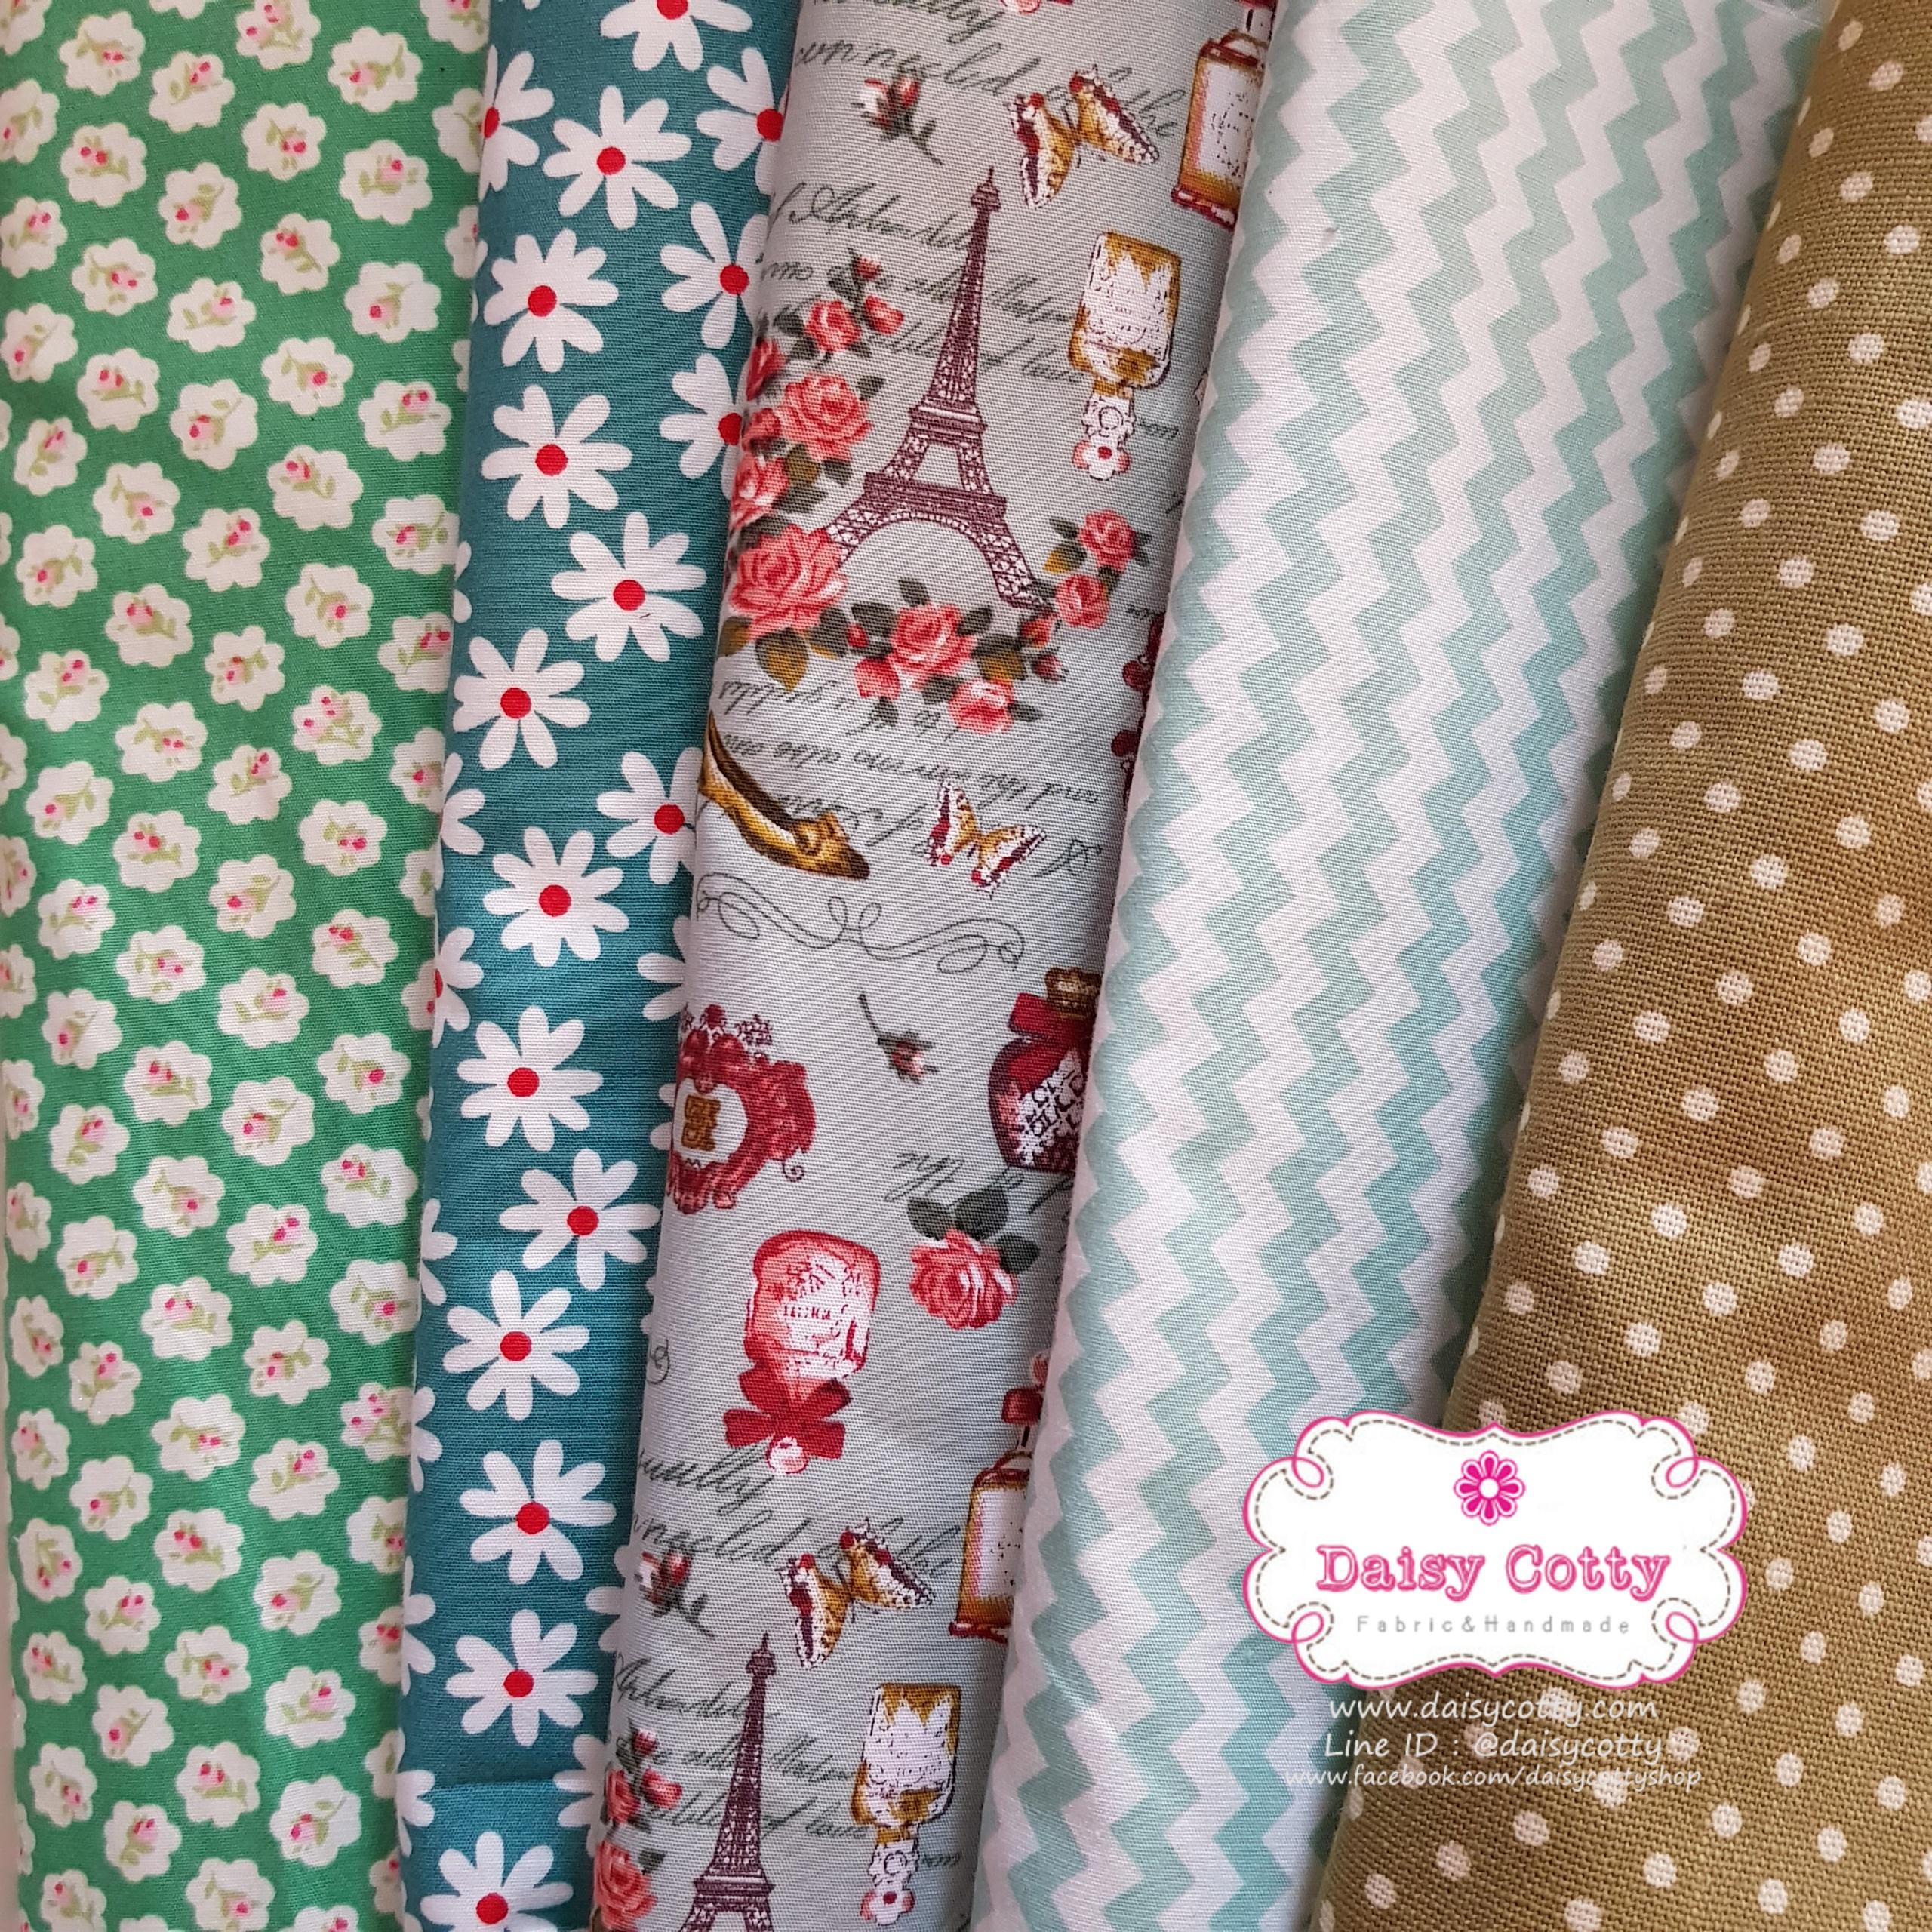 Set 5 ชิ้น ผ้าคอตตอนไทย 4 ลายและผ้าแคนวาสลายจุด โทนสีเขียว แต่ละชิ้นขนาด 27.5×50 ซม.